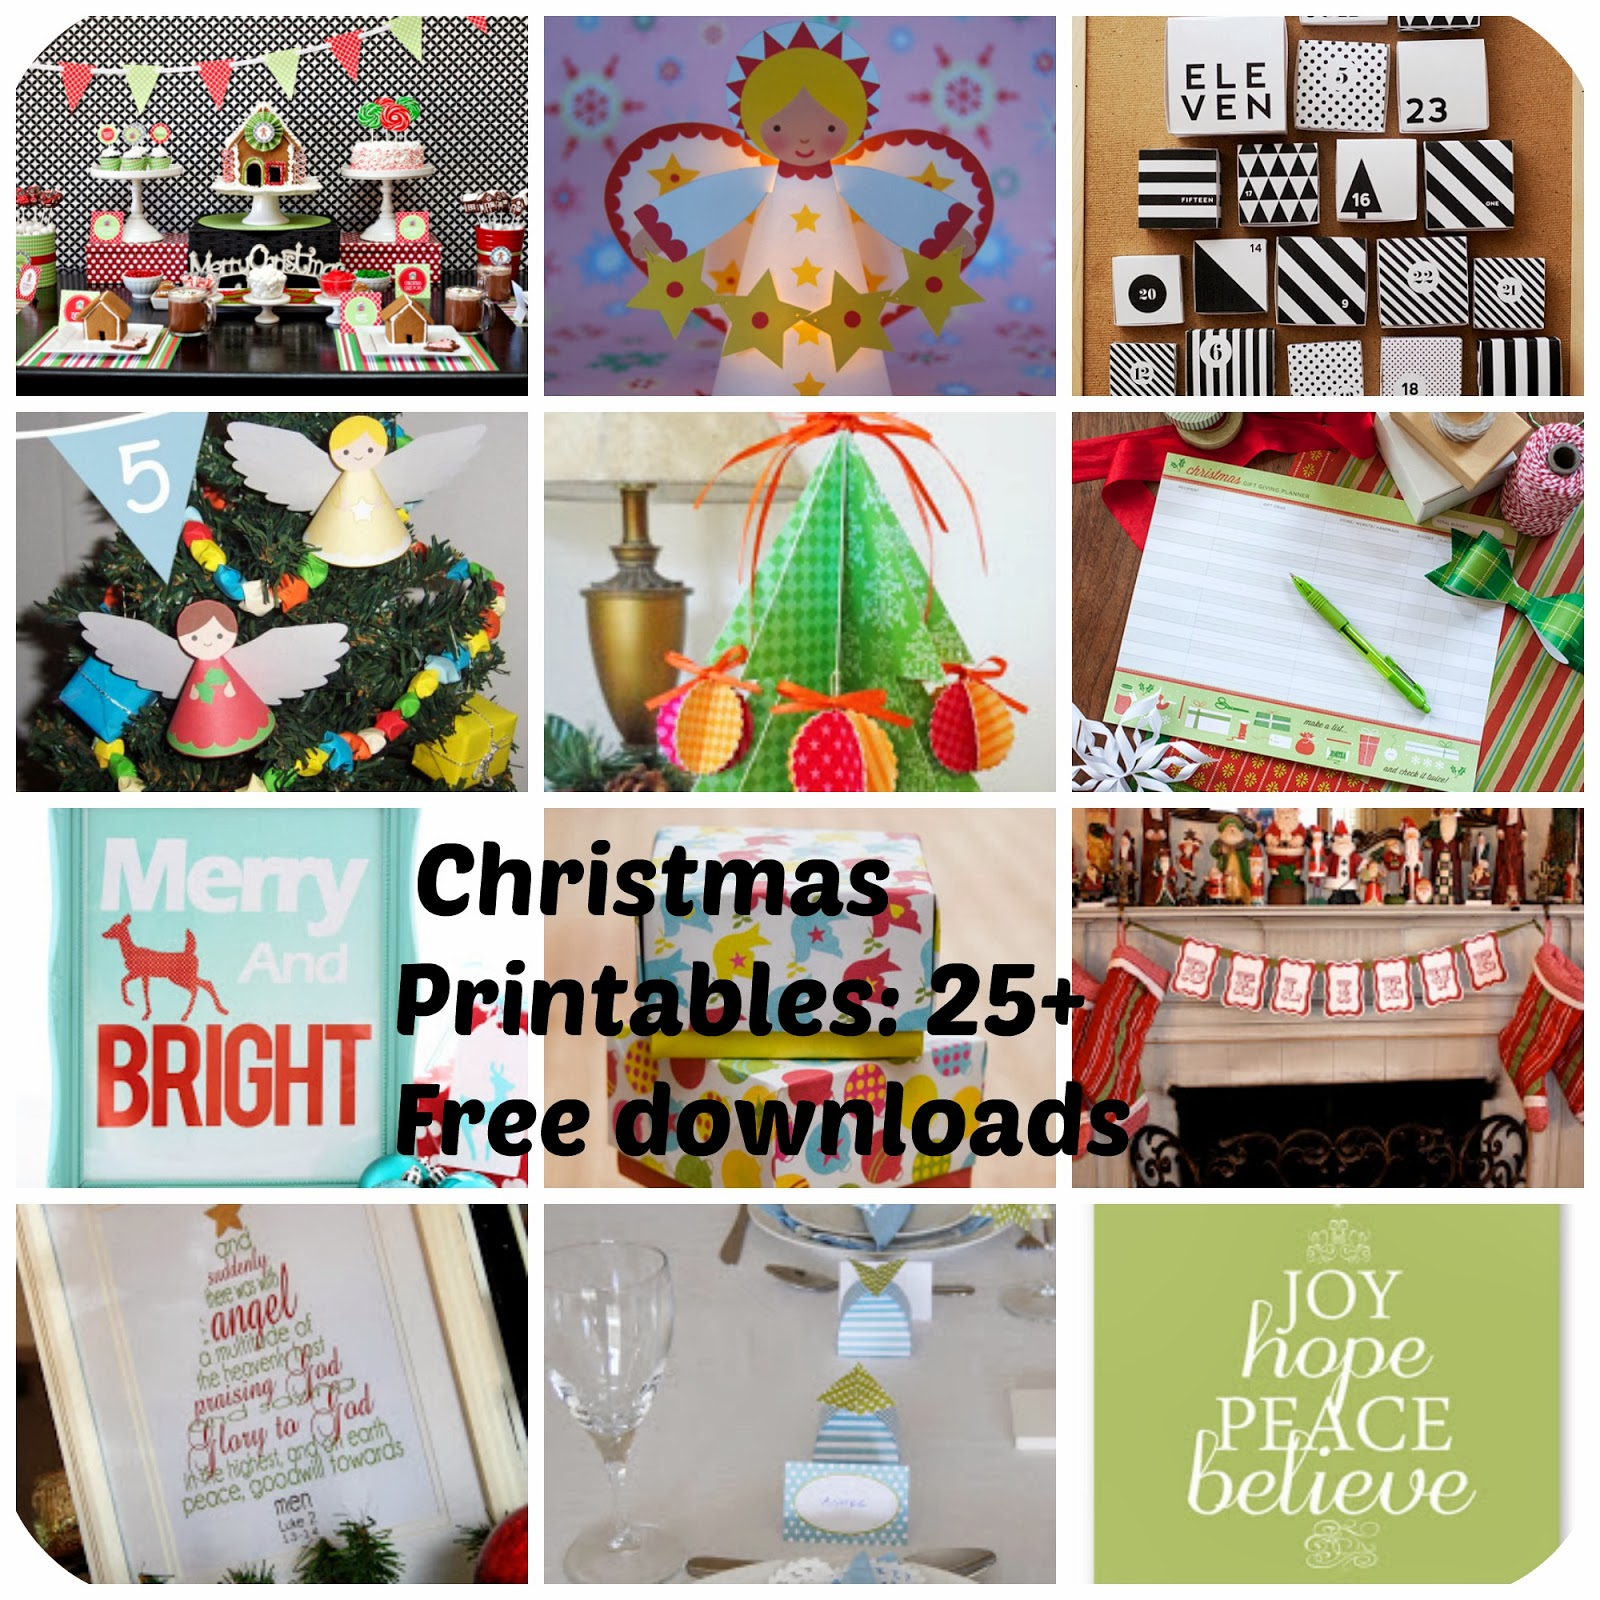 Tinker Tinker Craft Christmas Printables Free Downloads for